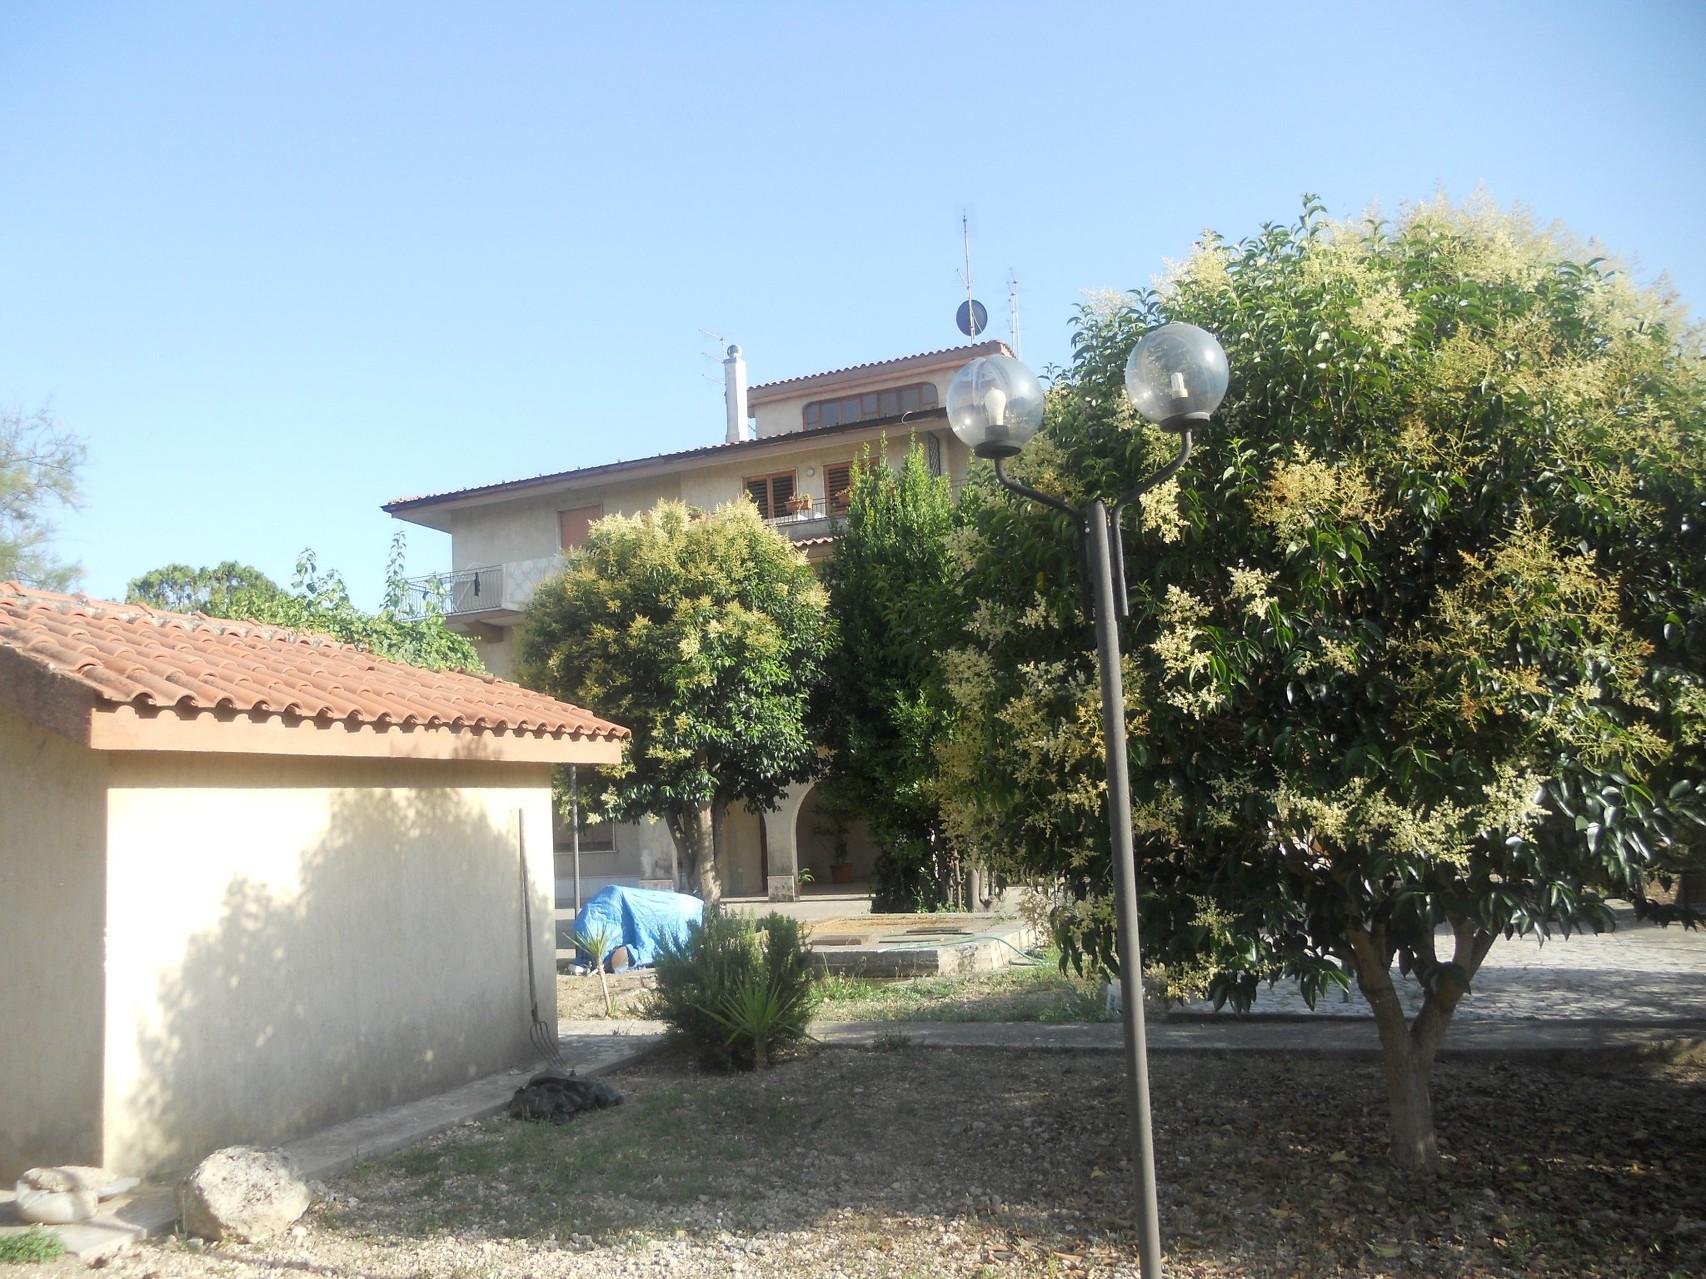 Vista della villa.